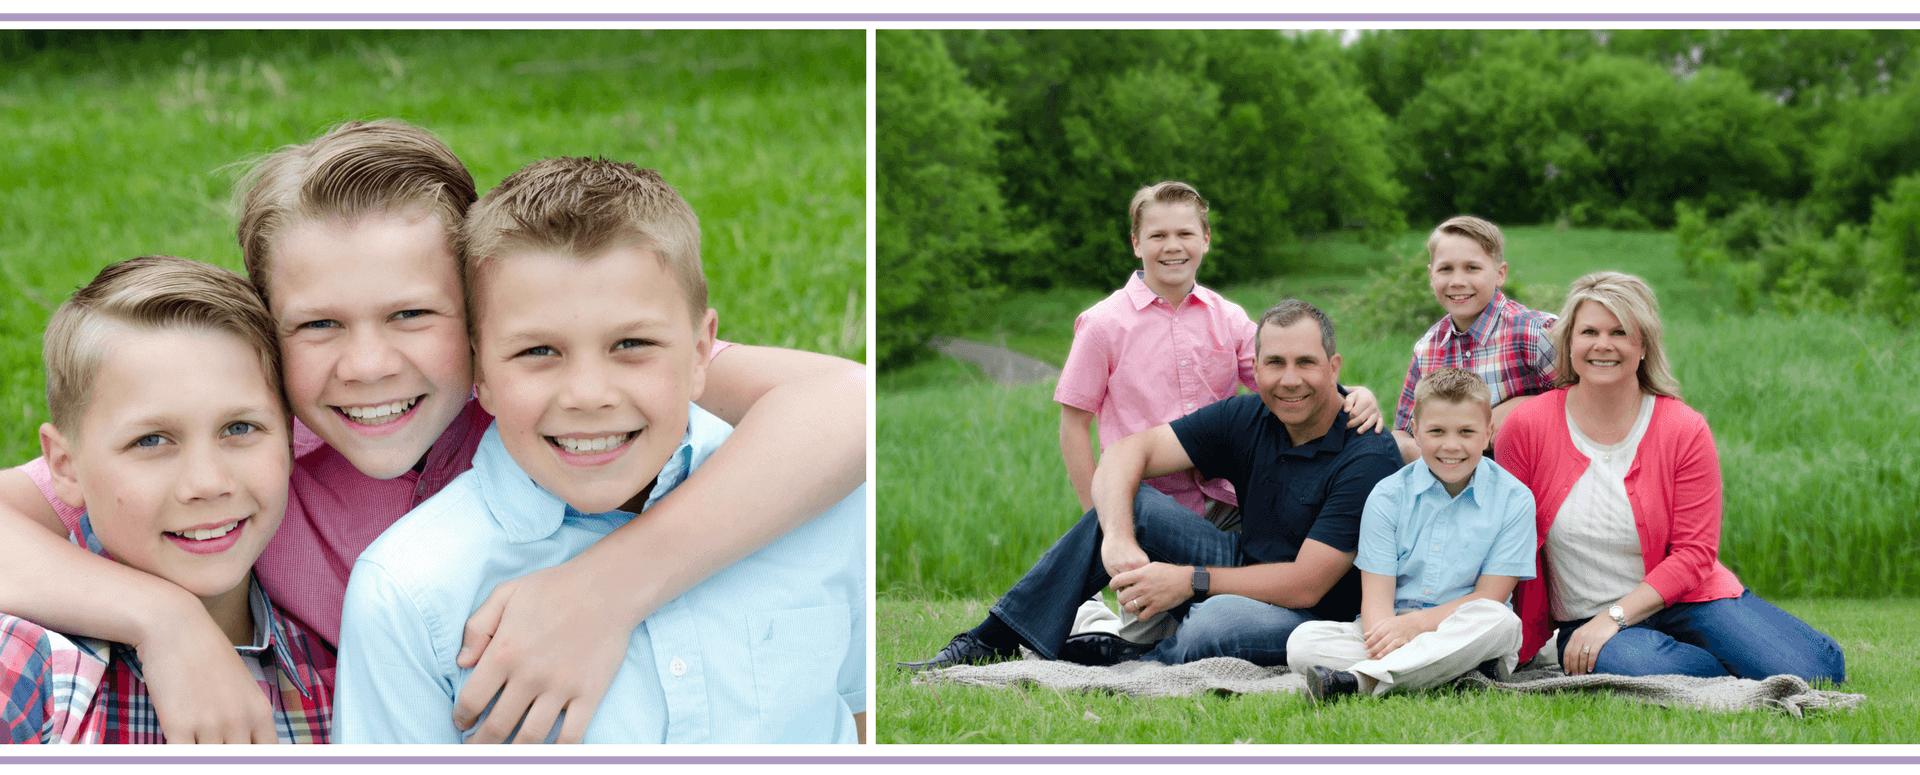 Woodbury MN Photographer   Professional Family Photographer   Focus Photography by Susan